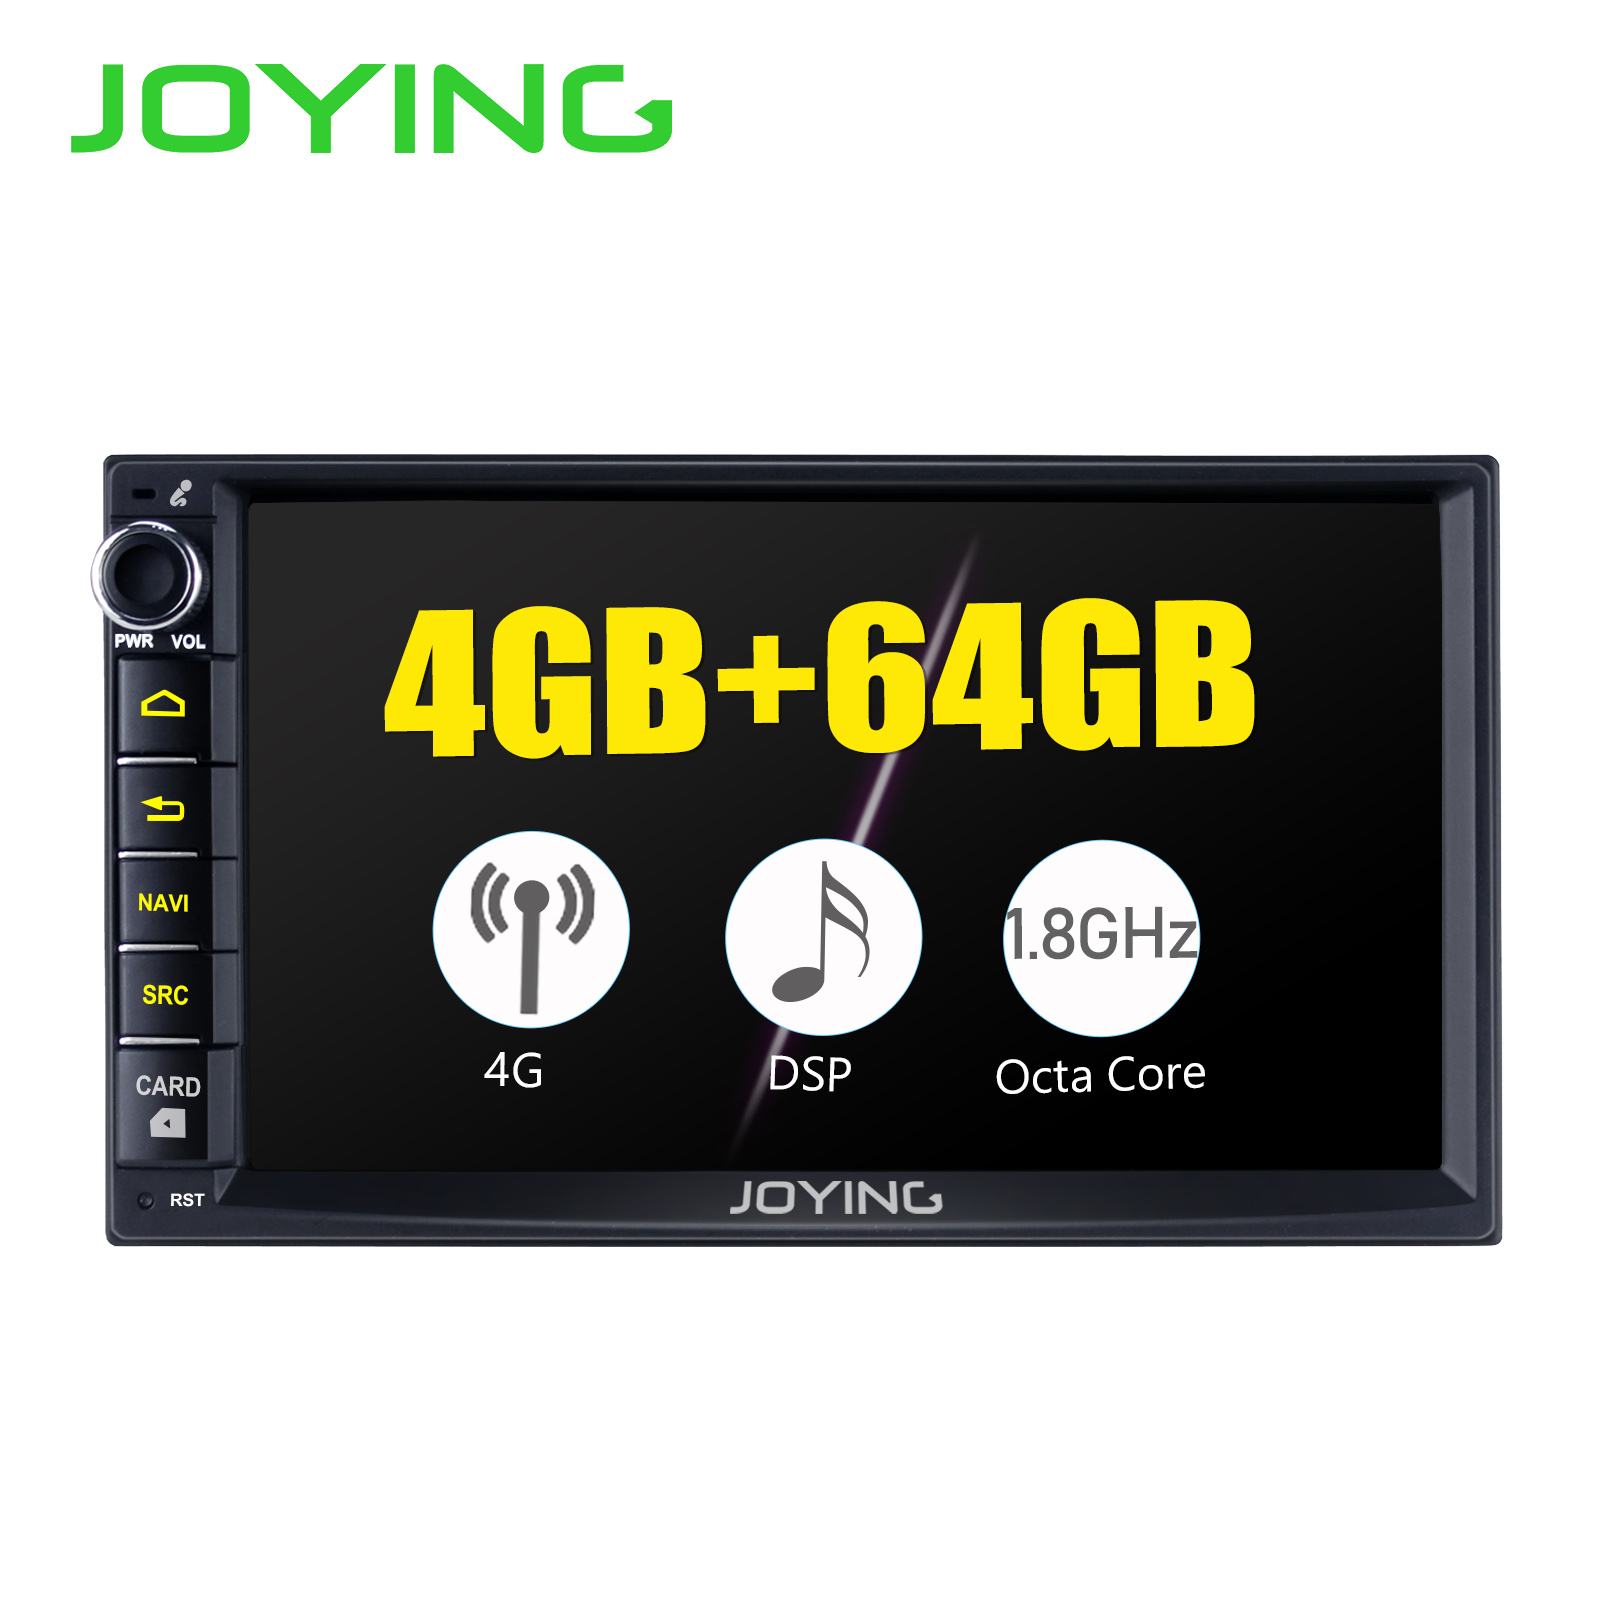 JOYING 2 din Android 8.1 Car radio GPS Núcleo octa 1024*600 GB + 64 4GB de áudio estéreo 7